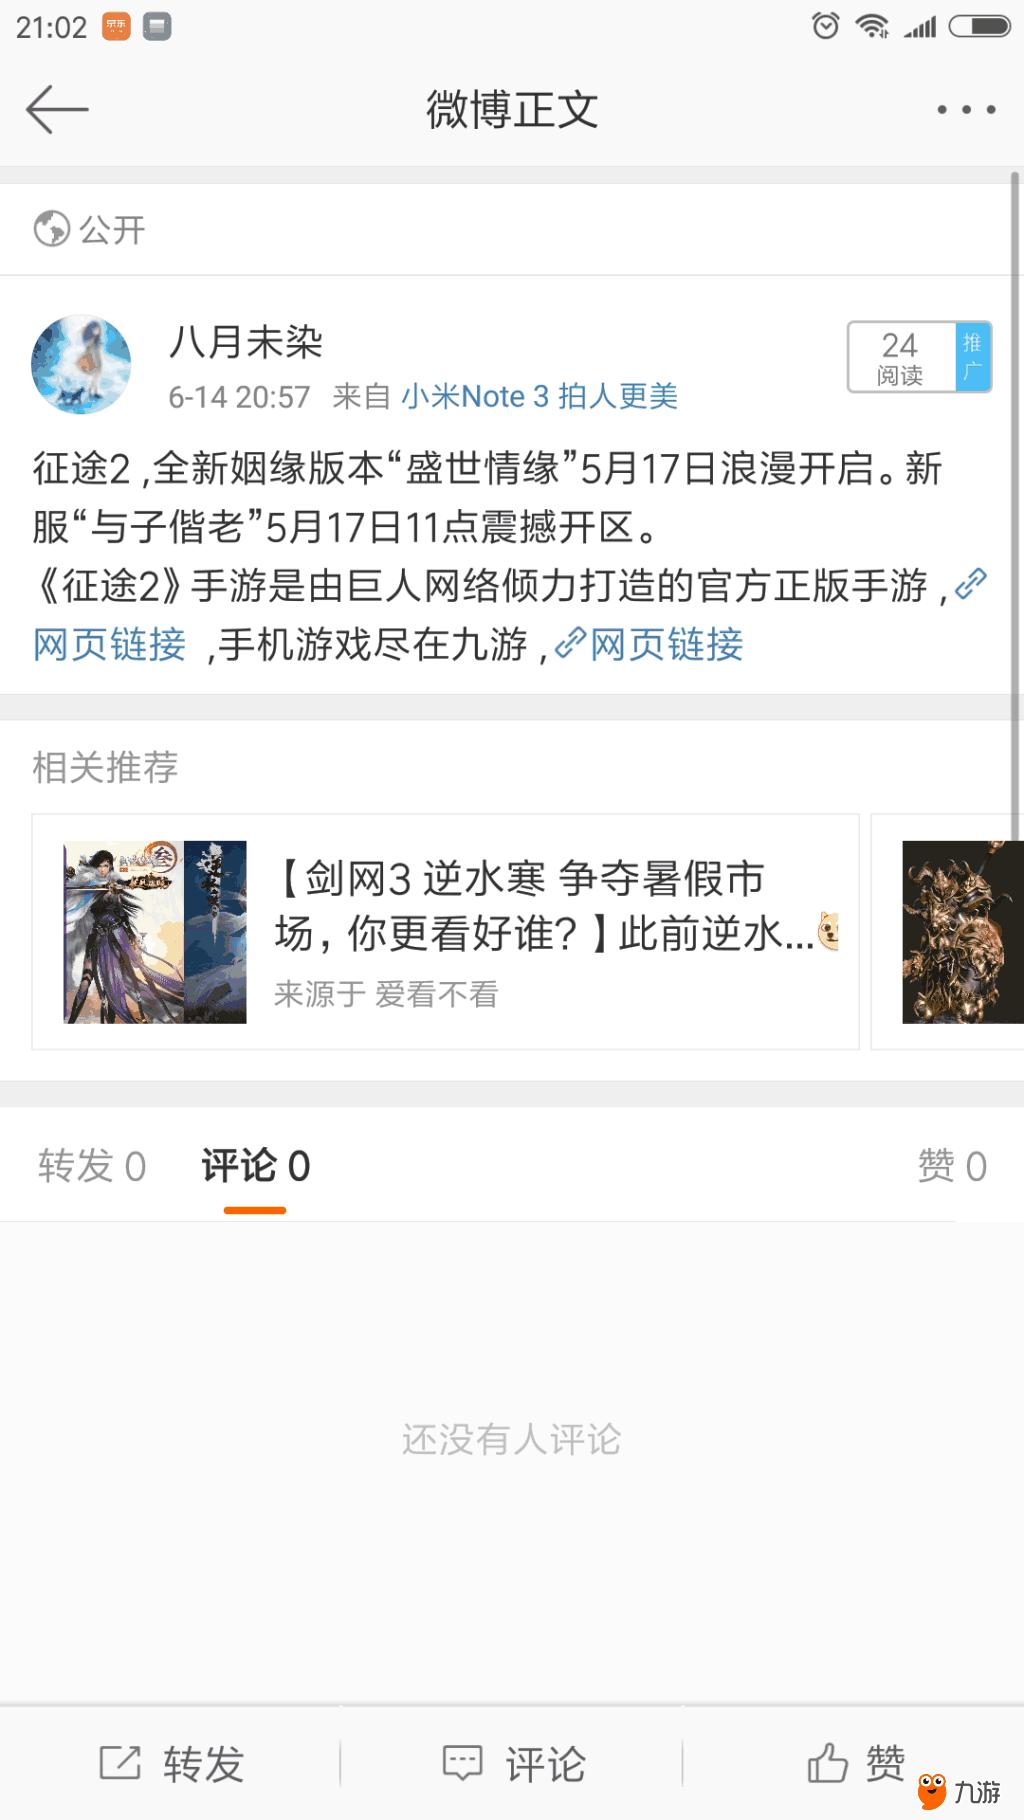 Screenshot_2018s06s14s21s02s05s736_com.sina.weibo.png